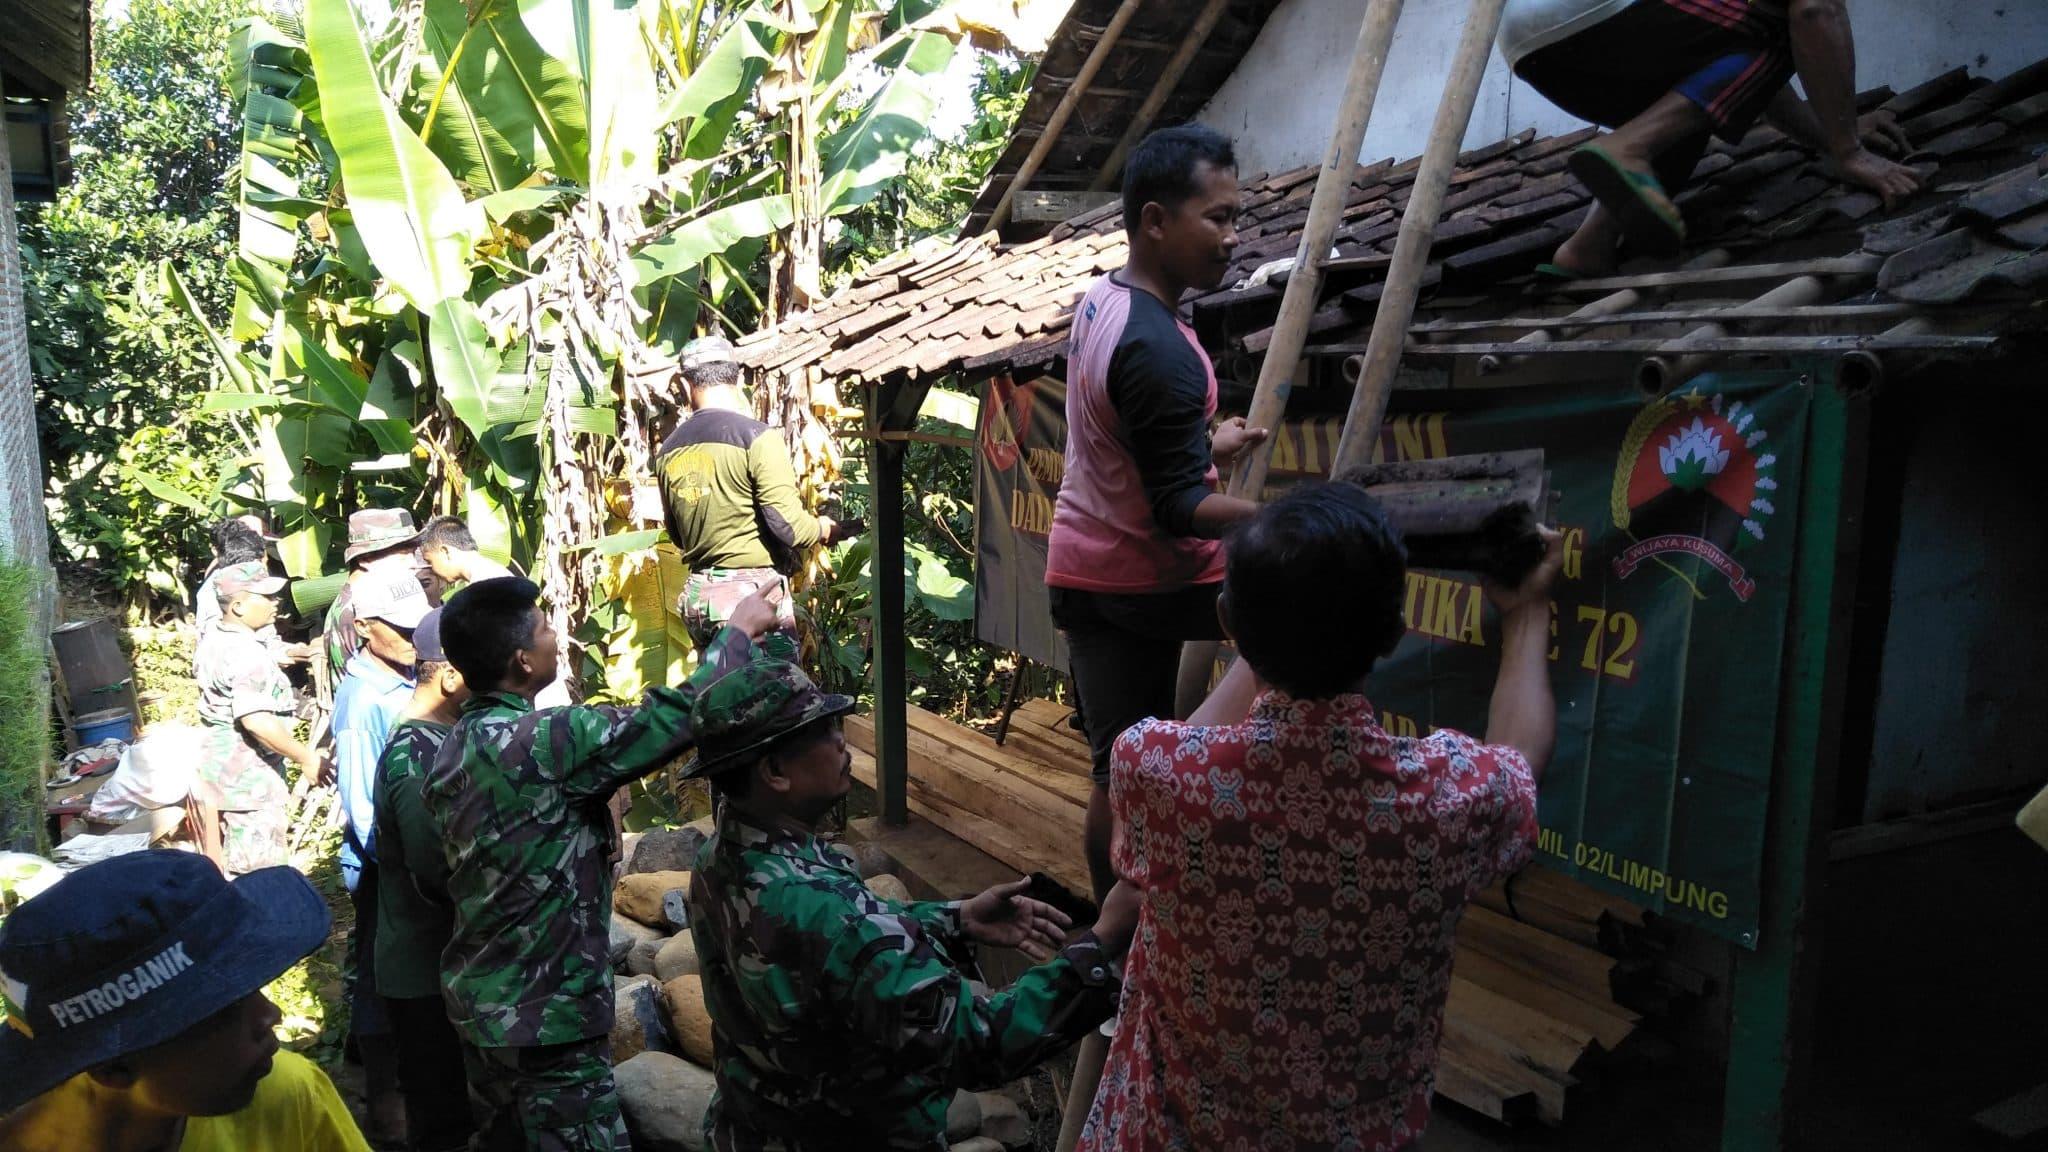 Sudah Tidak Layak, Koramil 02/Limpung Bongkar Rumah Mbah Samidi